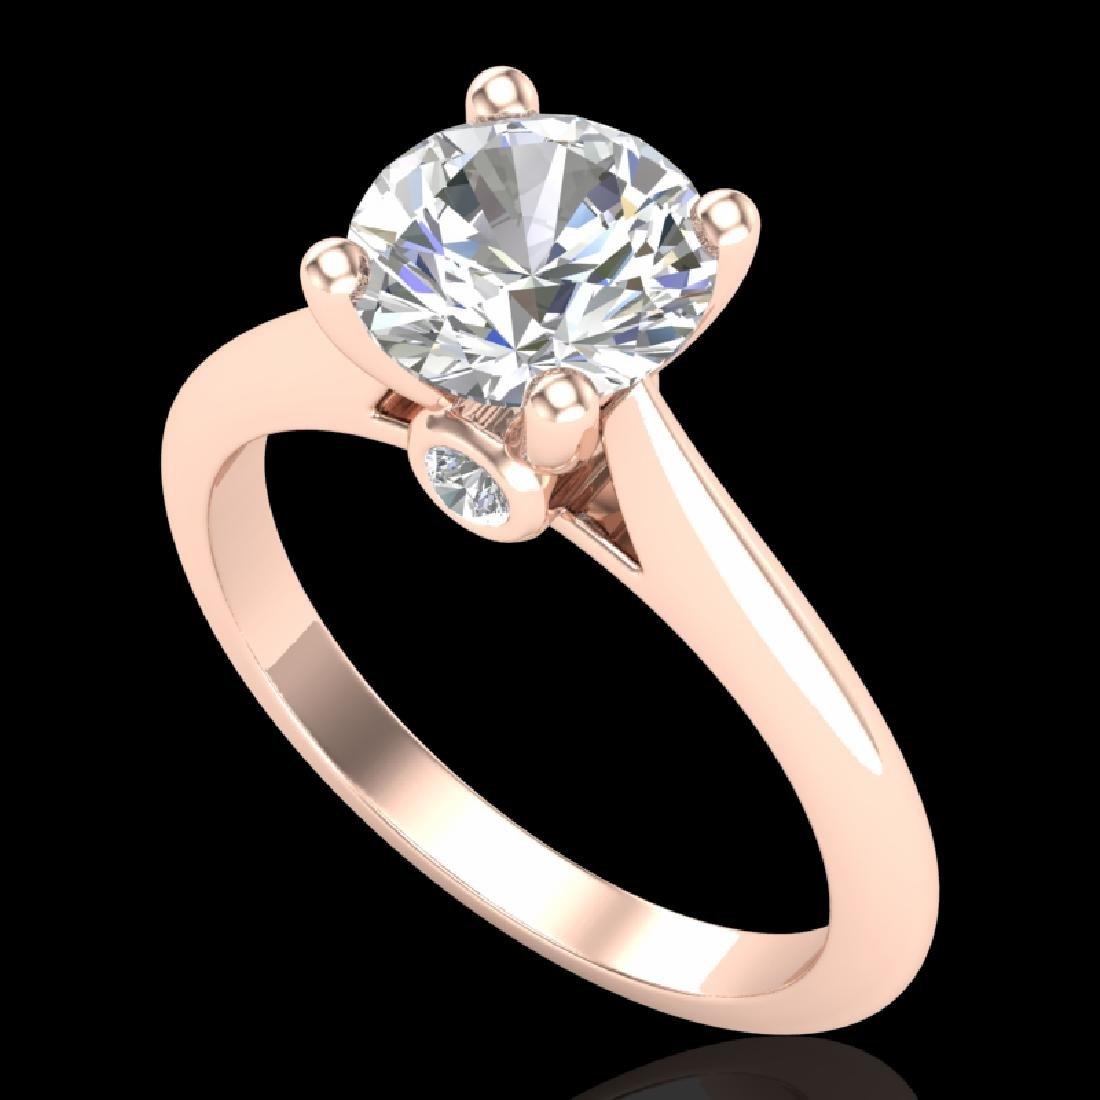 1.6 CTW VS/SI Diamond Art Deco Ring 18K Rose Gold